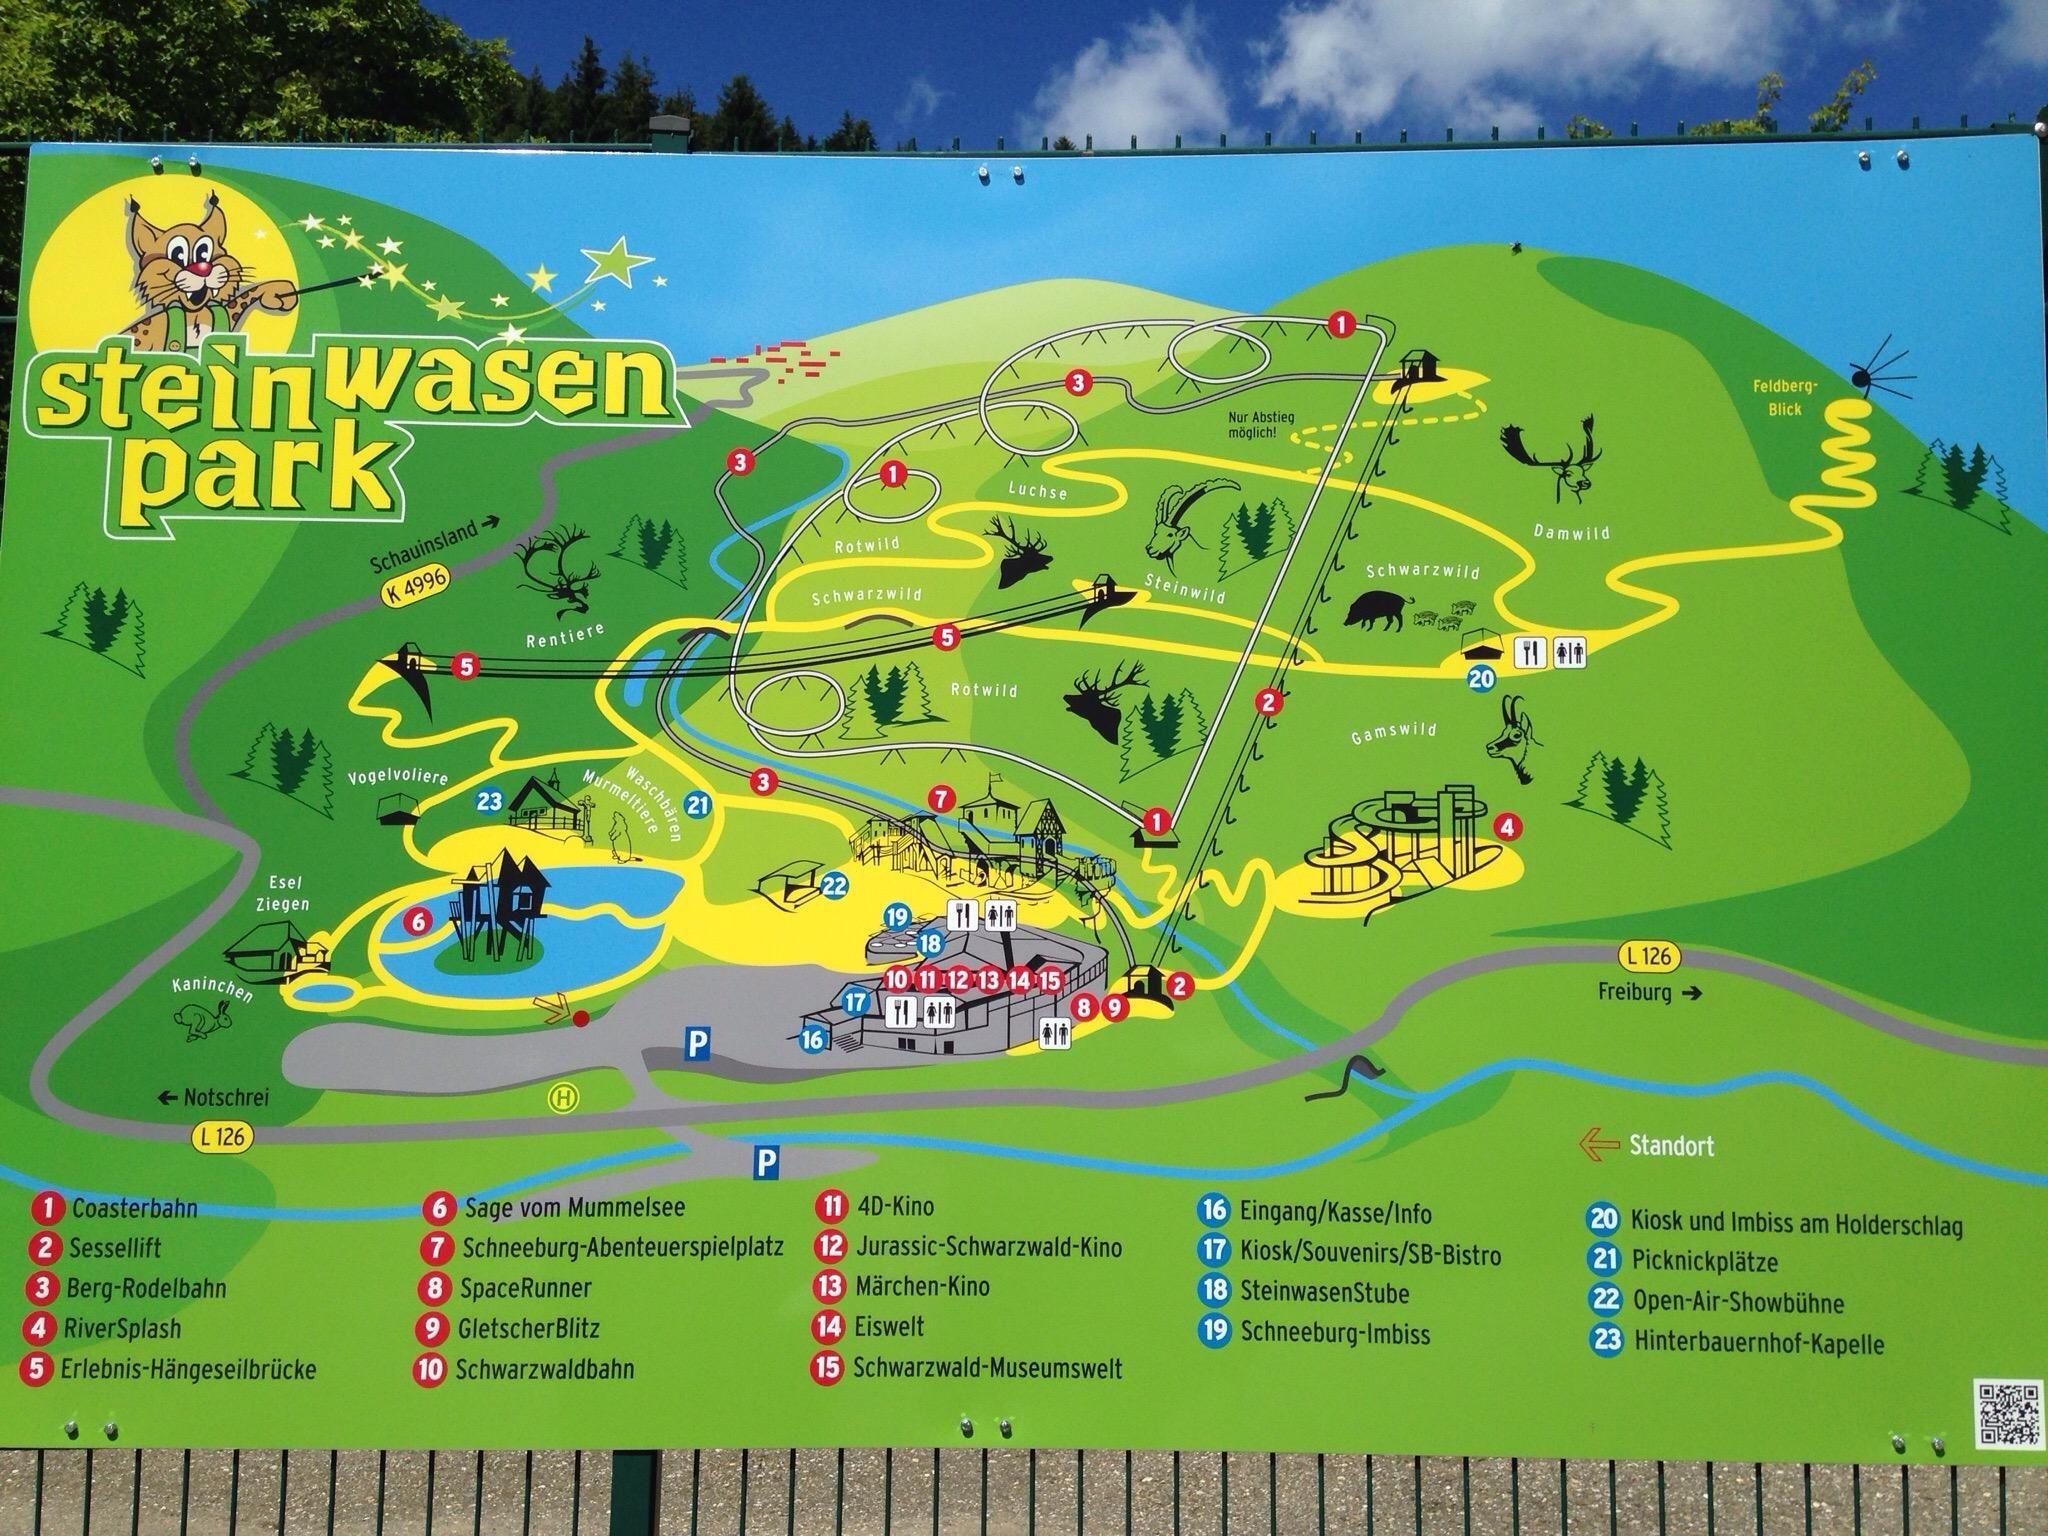 Steinwasen Park Trip Advisor Adventure Park Park